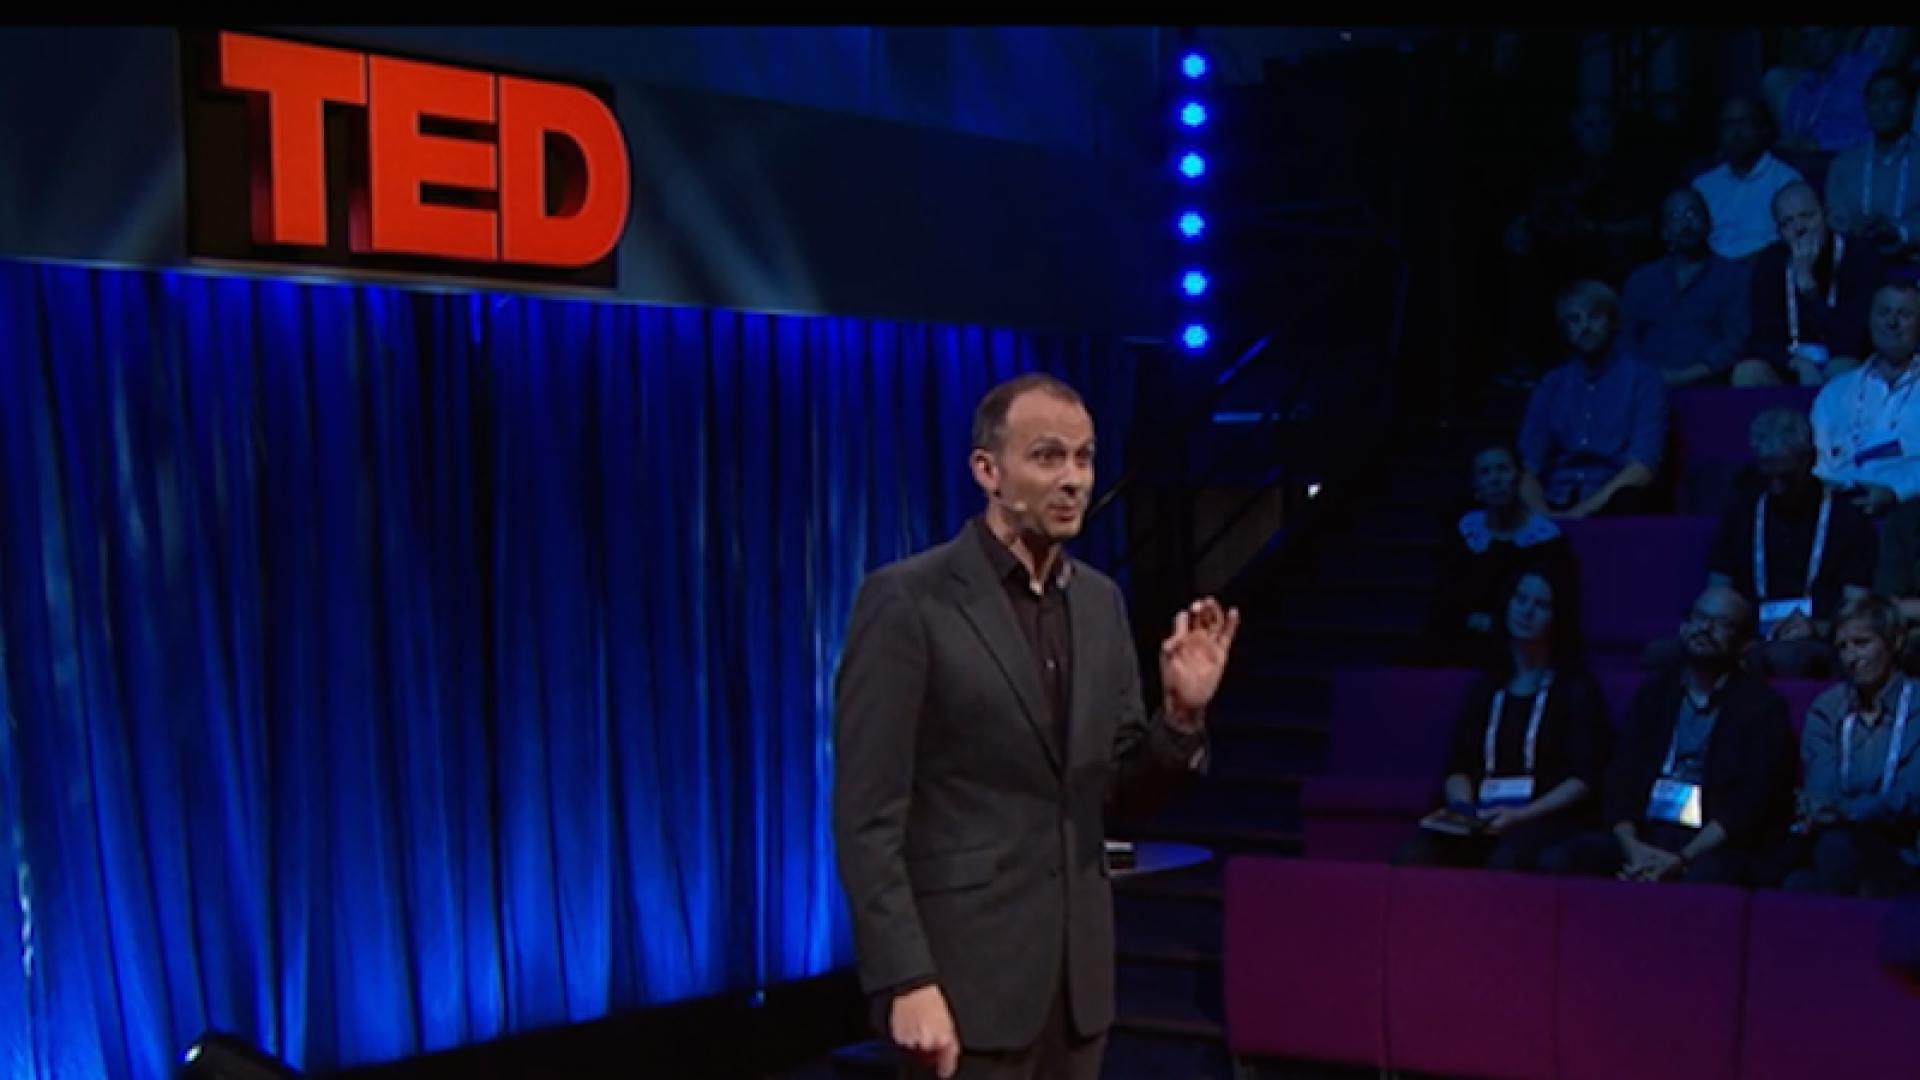 Economist Tim Harford delivering a TED Talk in London.